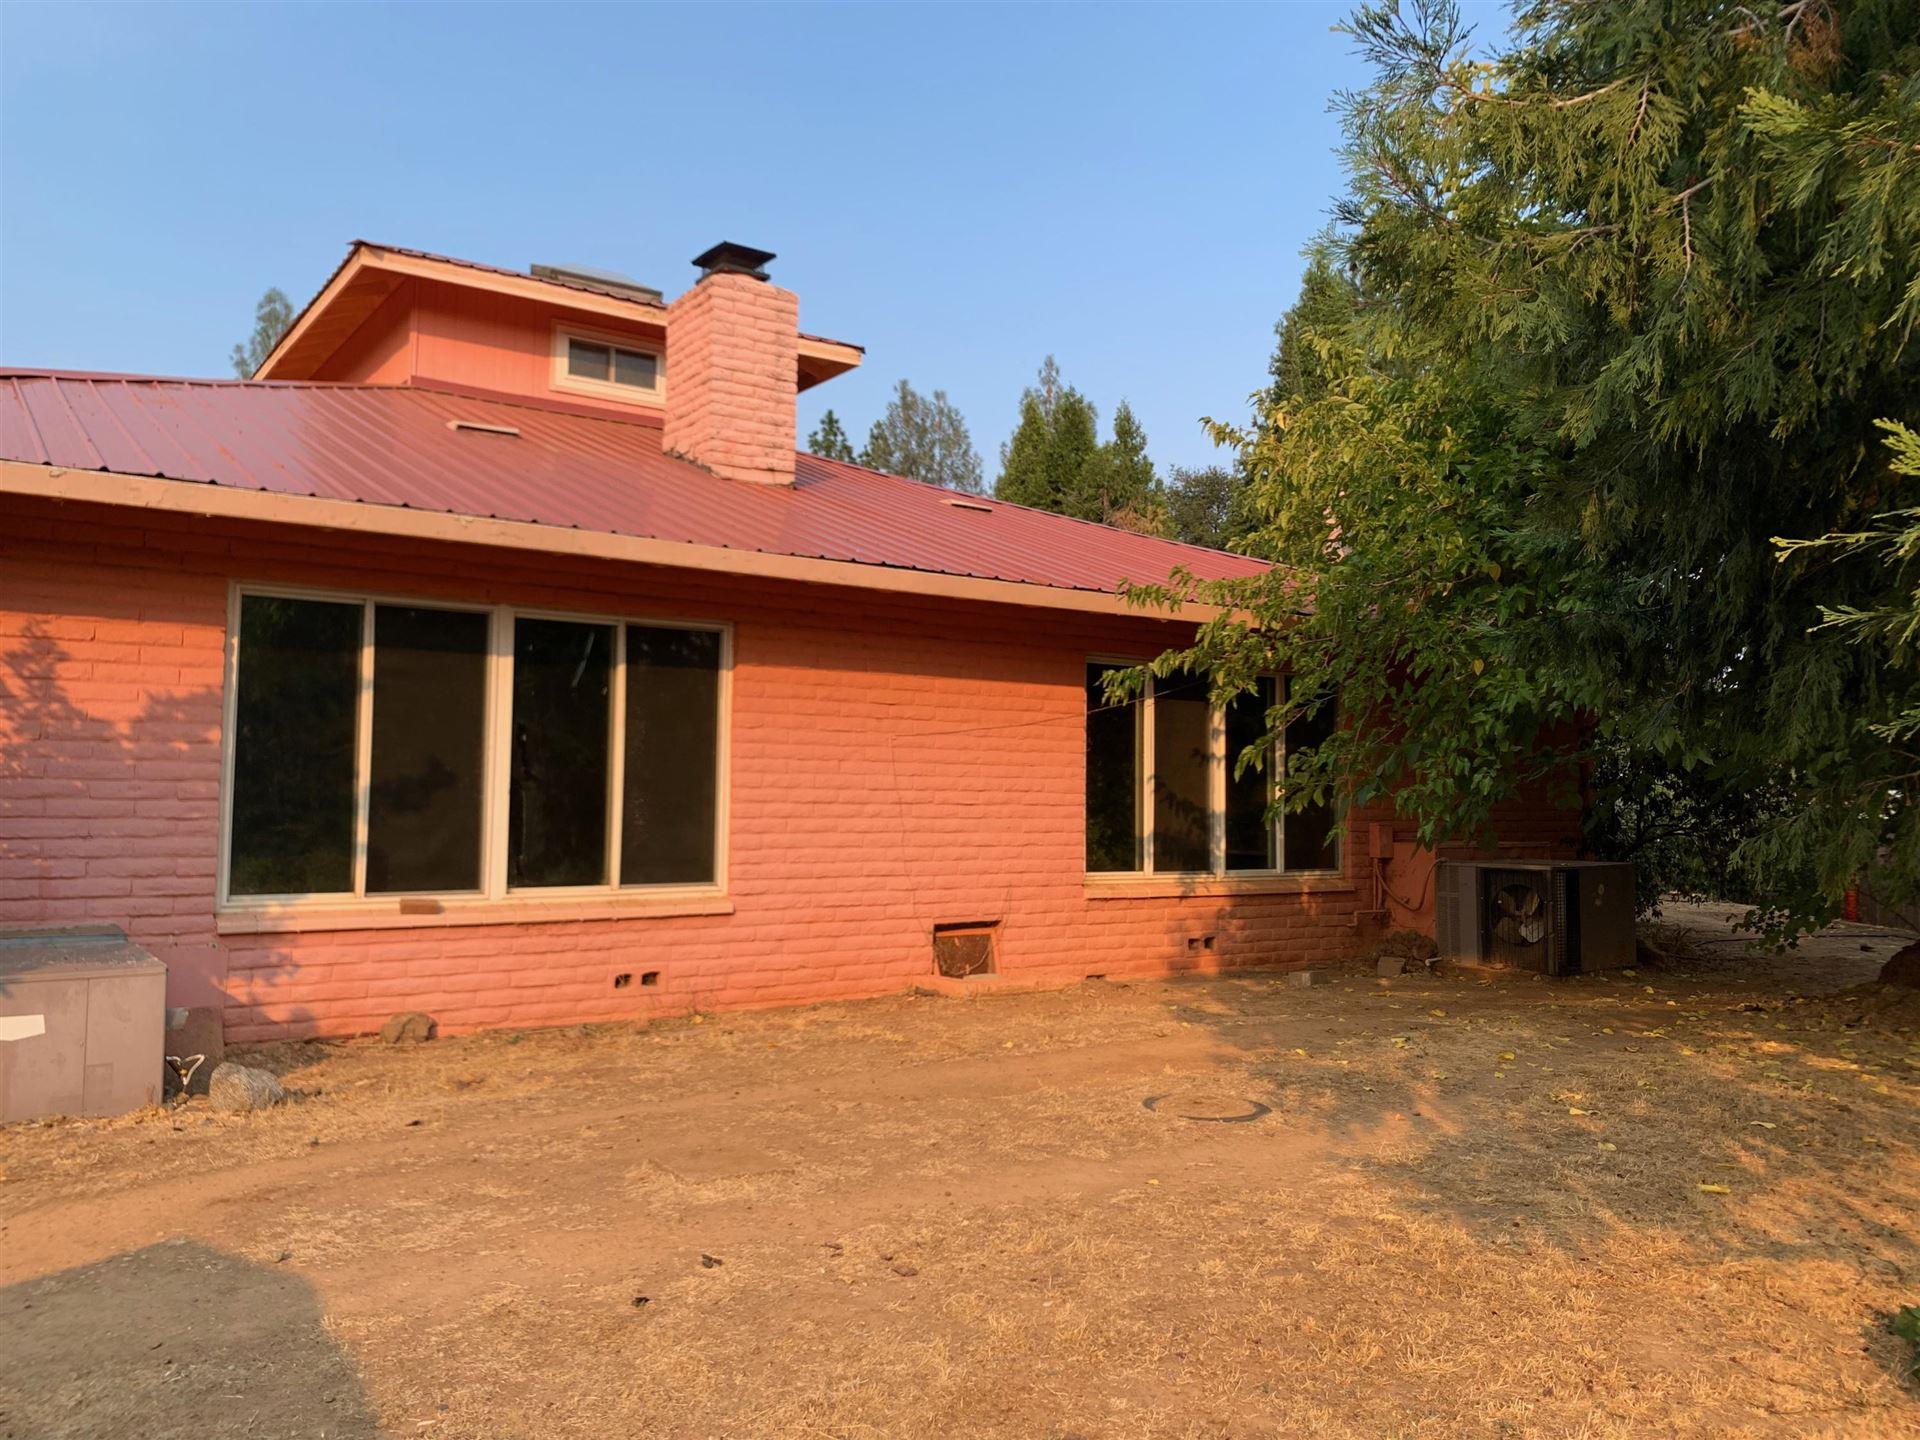 Photo of 17923 Ranchera Rd, Shasta Lake, CA 96019 (MLS # 21-4016)